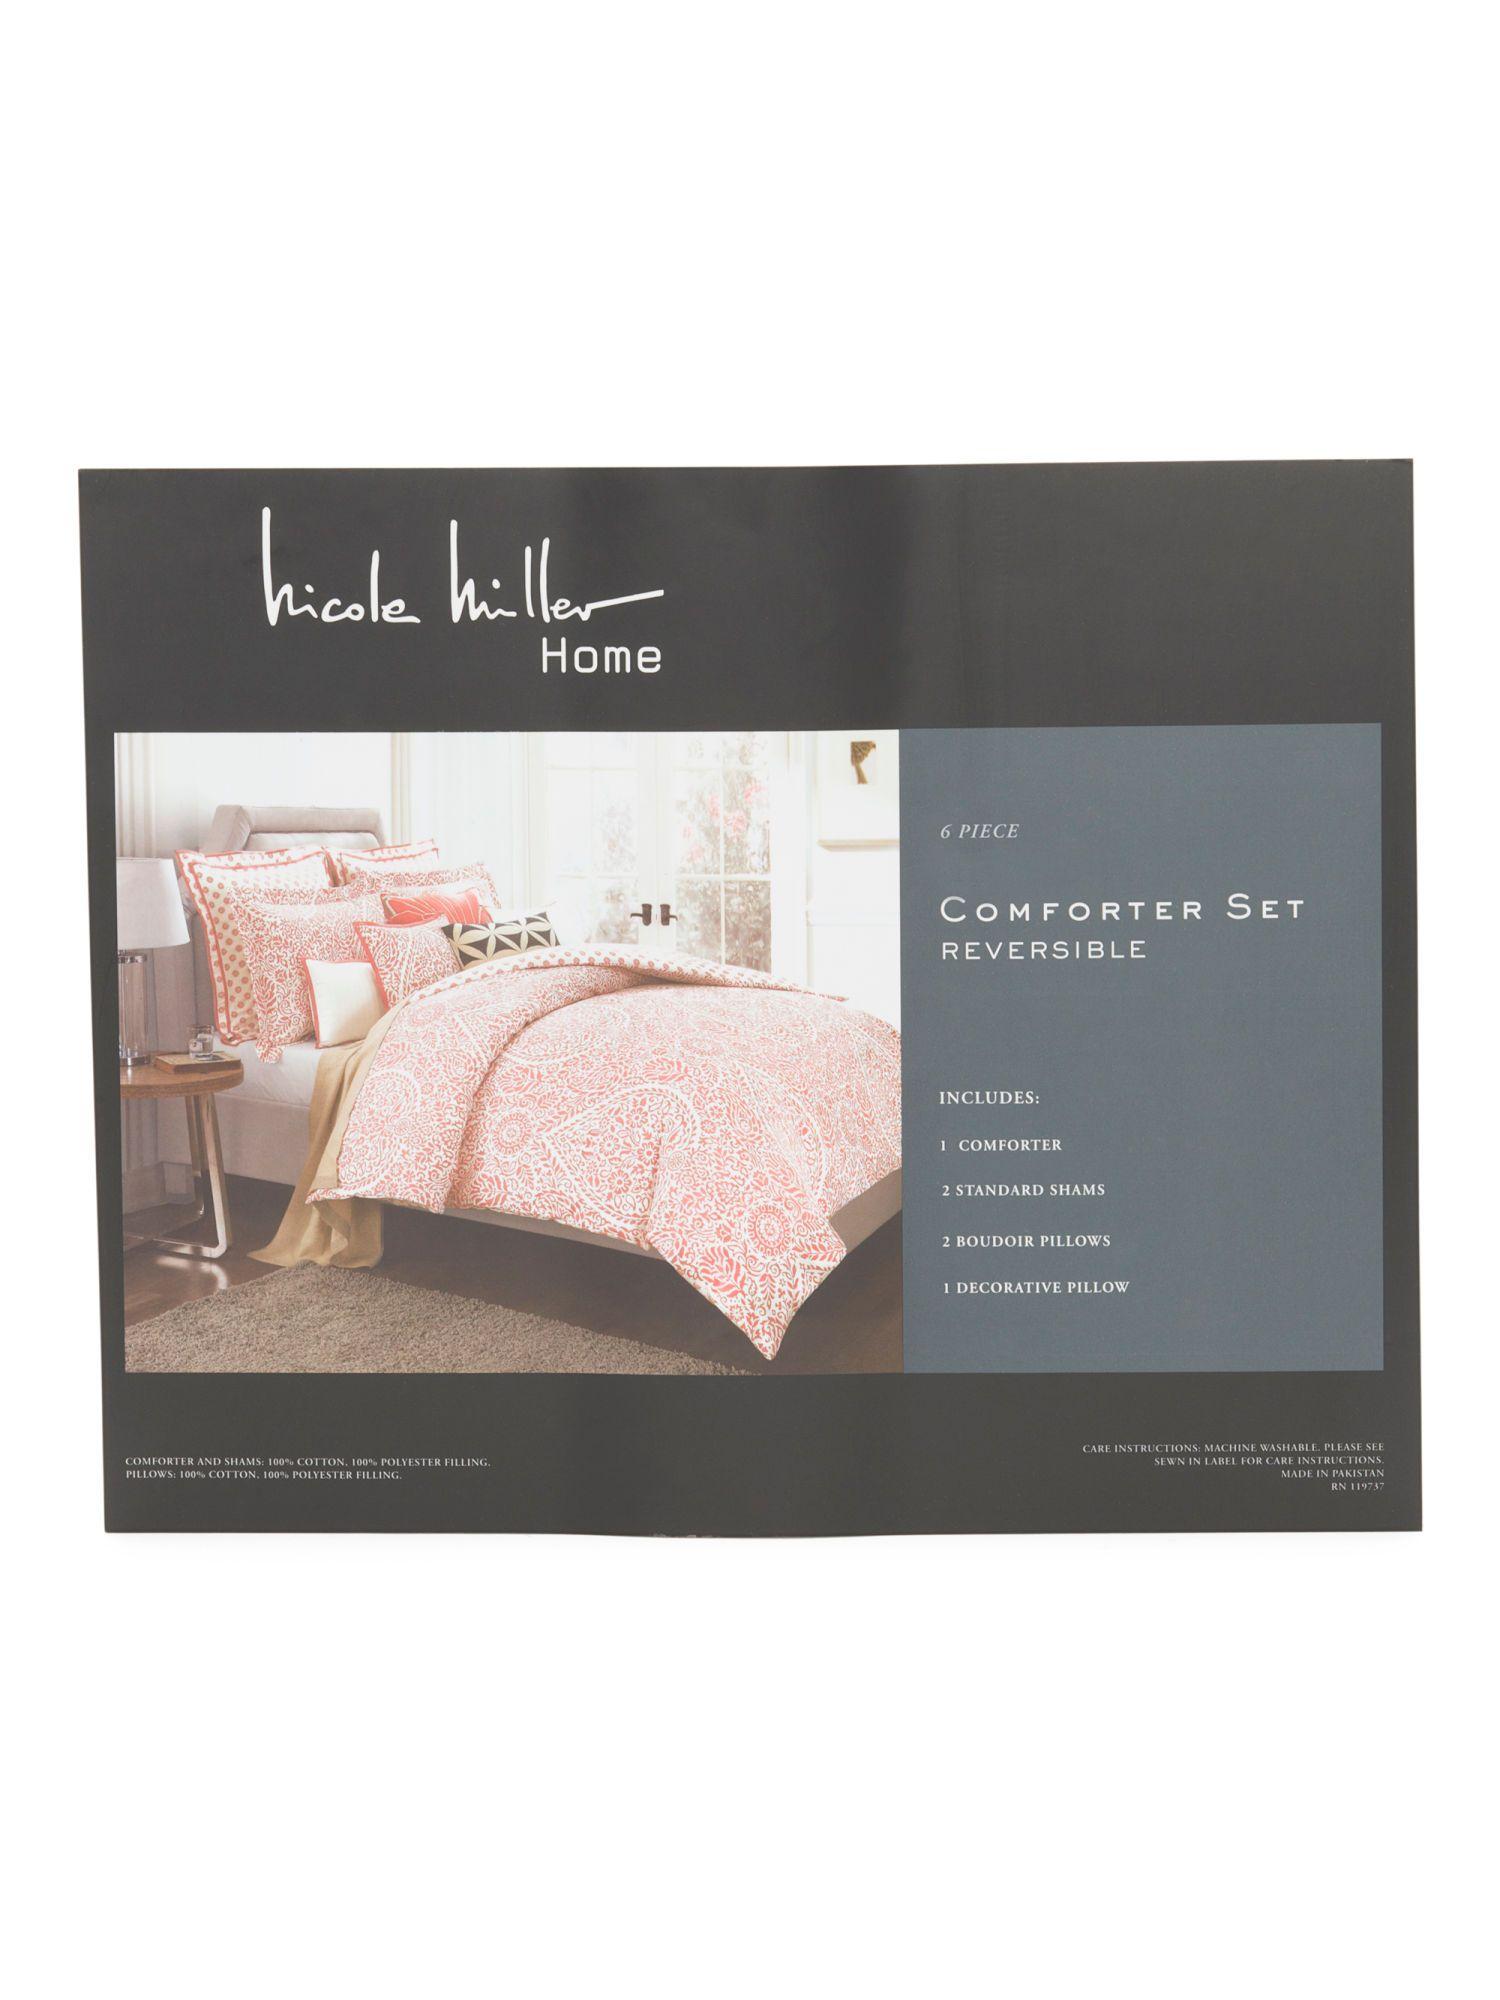 Nicole Miller Bedding Tj Maxx : nicole, miller, bedding, Lilya, Comforter, Comforters, Duvets, T.J.Maxx, Sets,, Home,